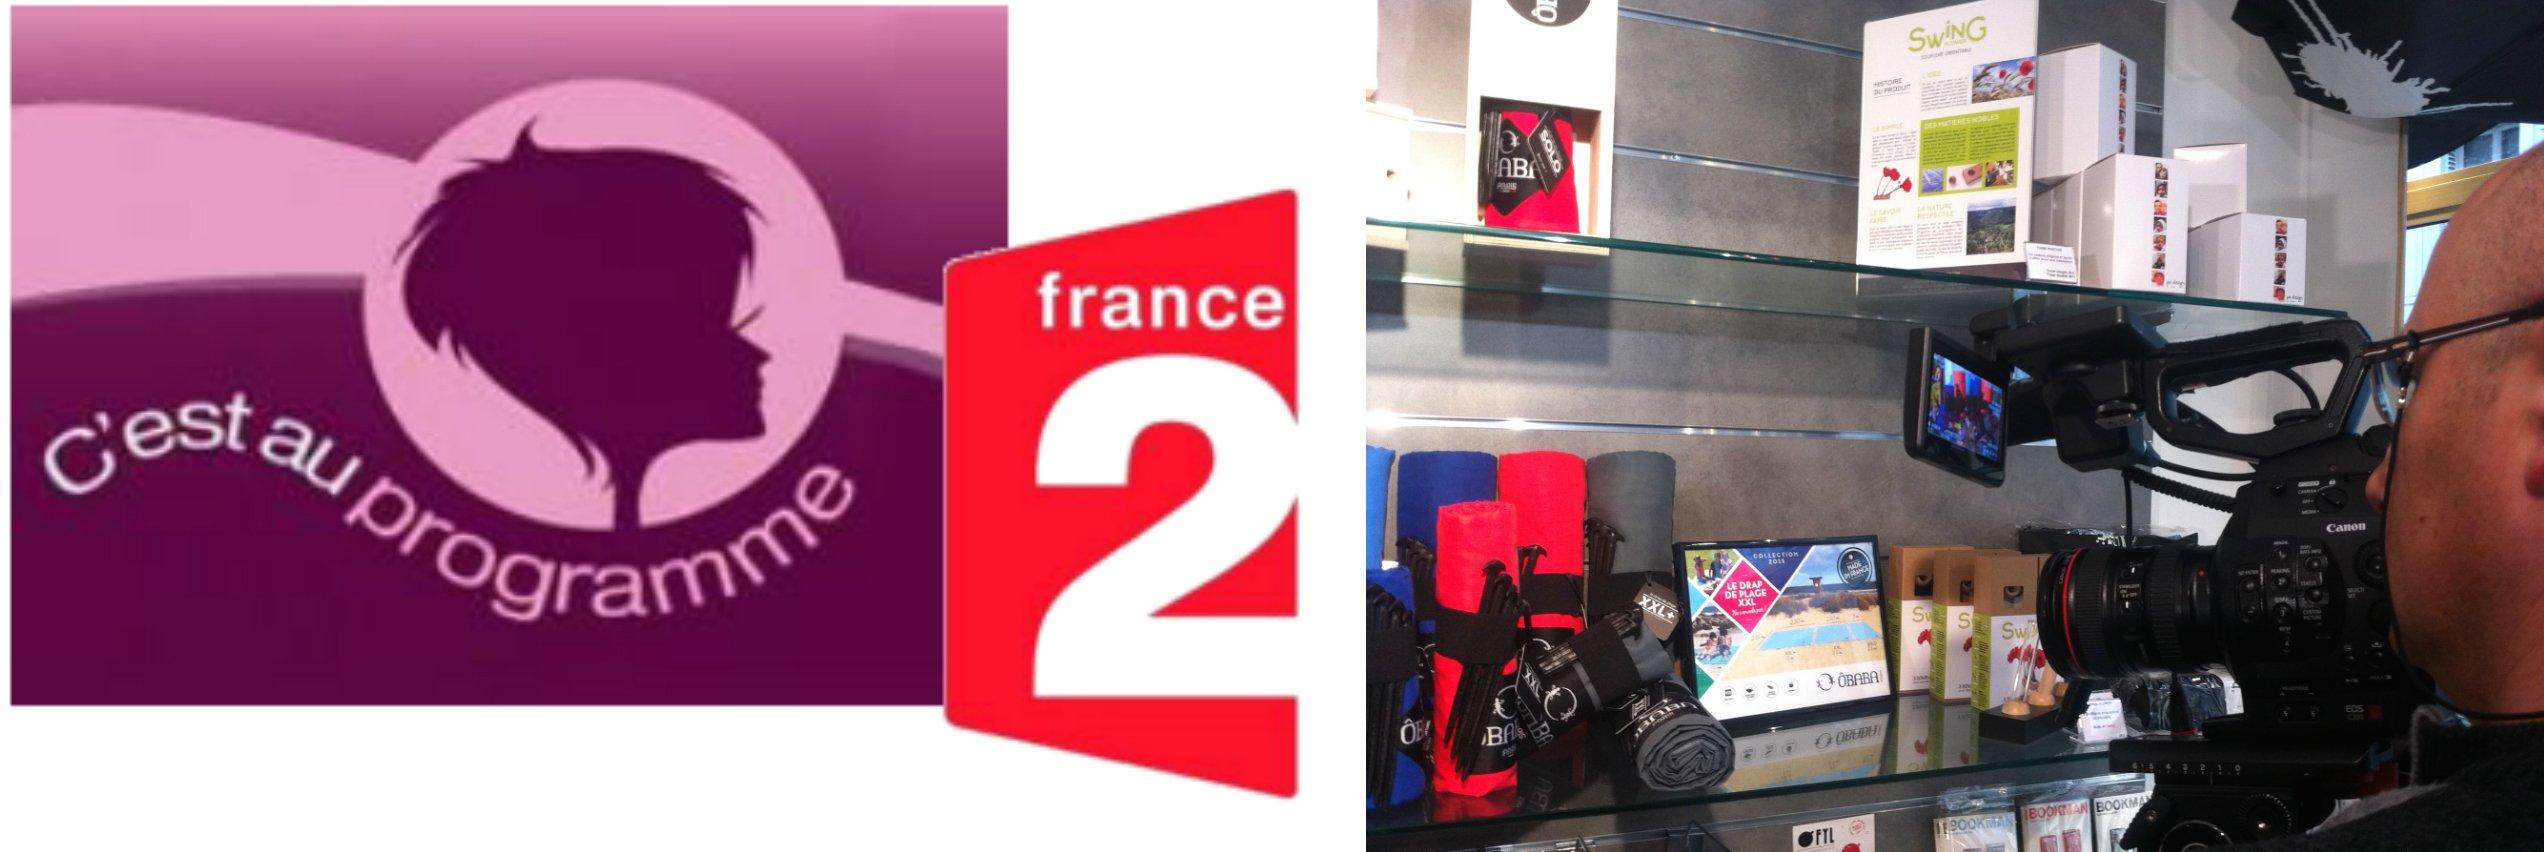 france2_carre.jpg